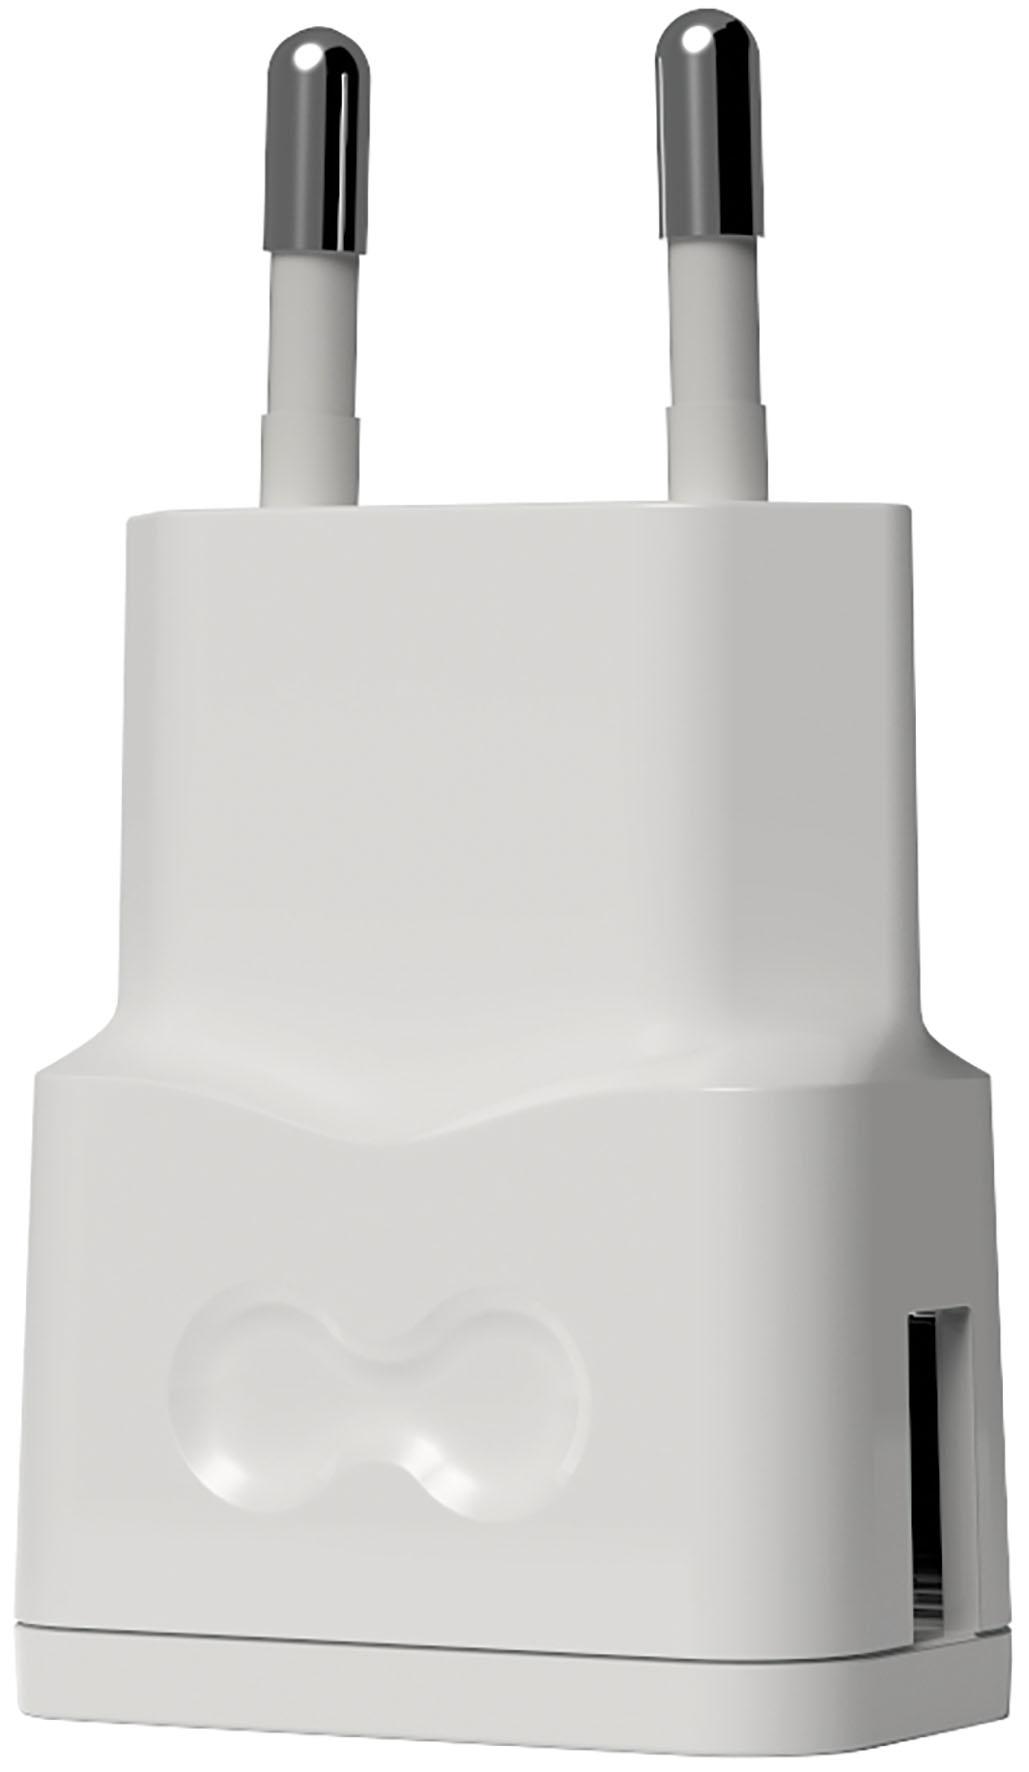 SPINA CARICATORE 1 USB